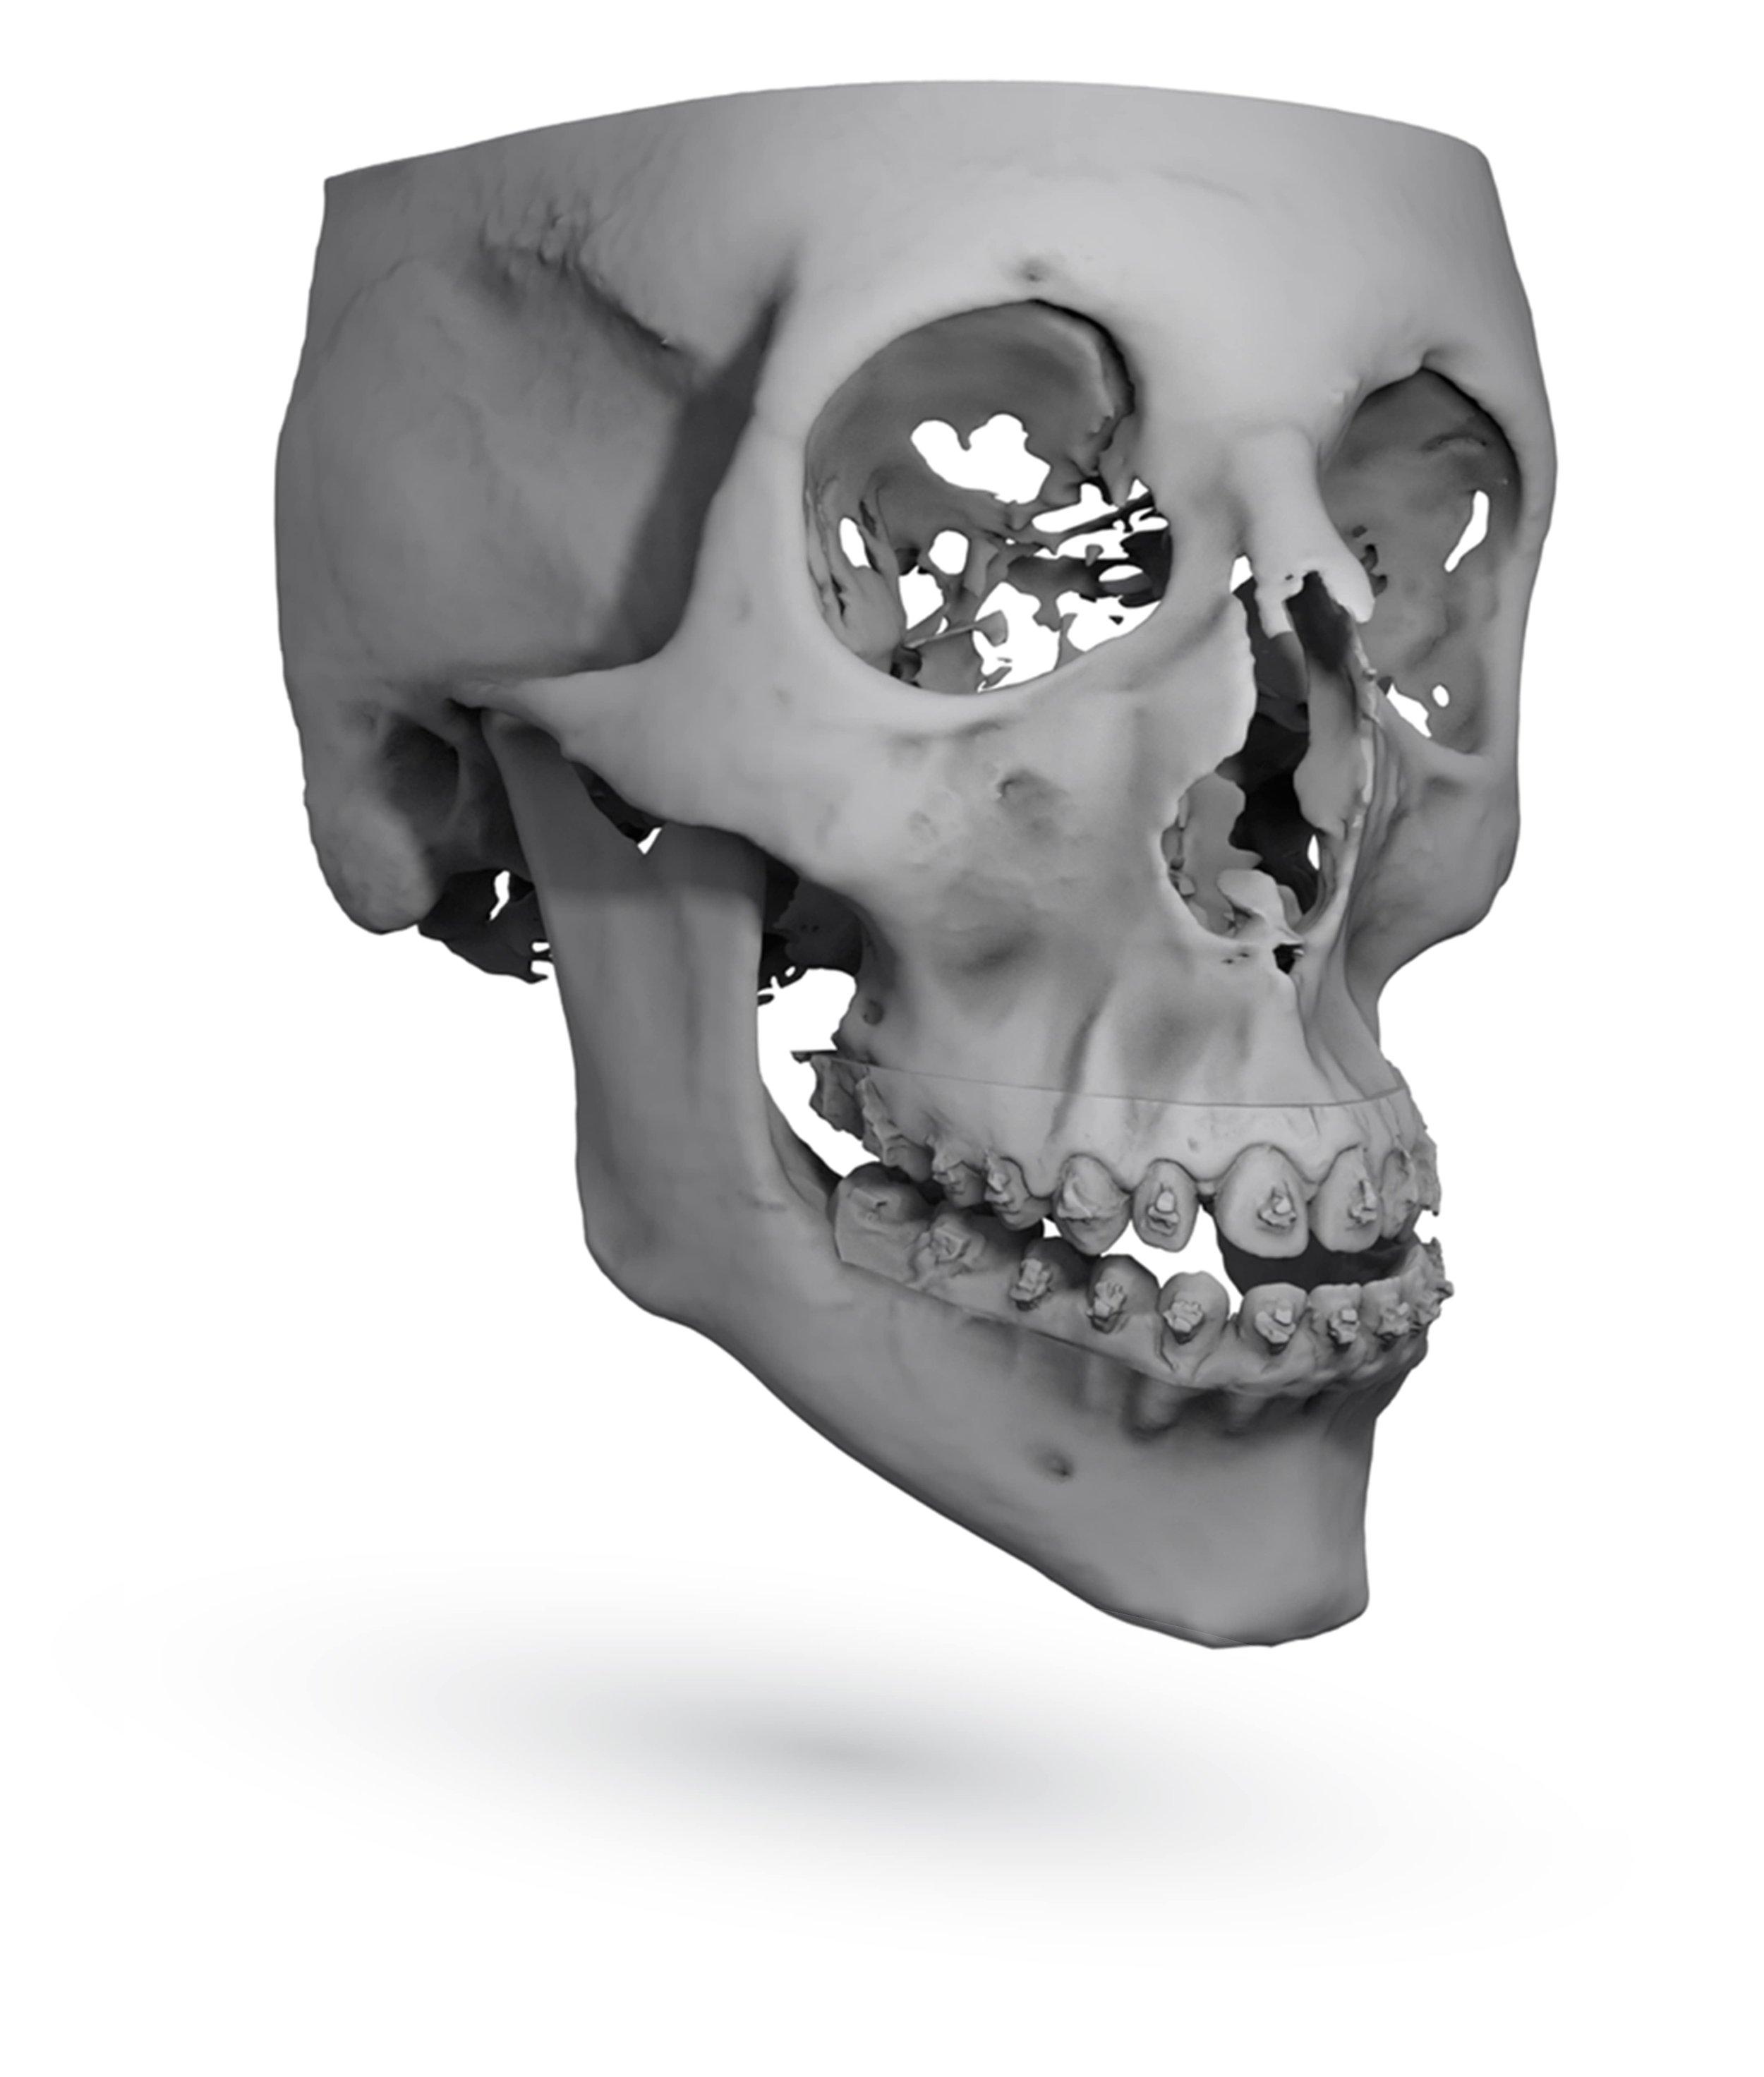 Final Orthognathic Skull Position by ImmersiveTouch IVSP